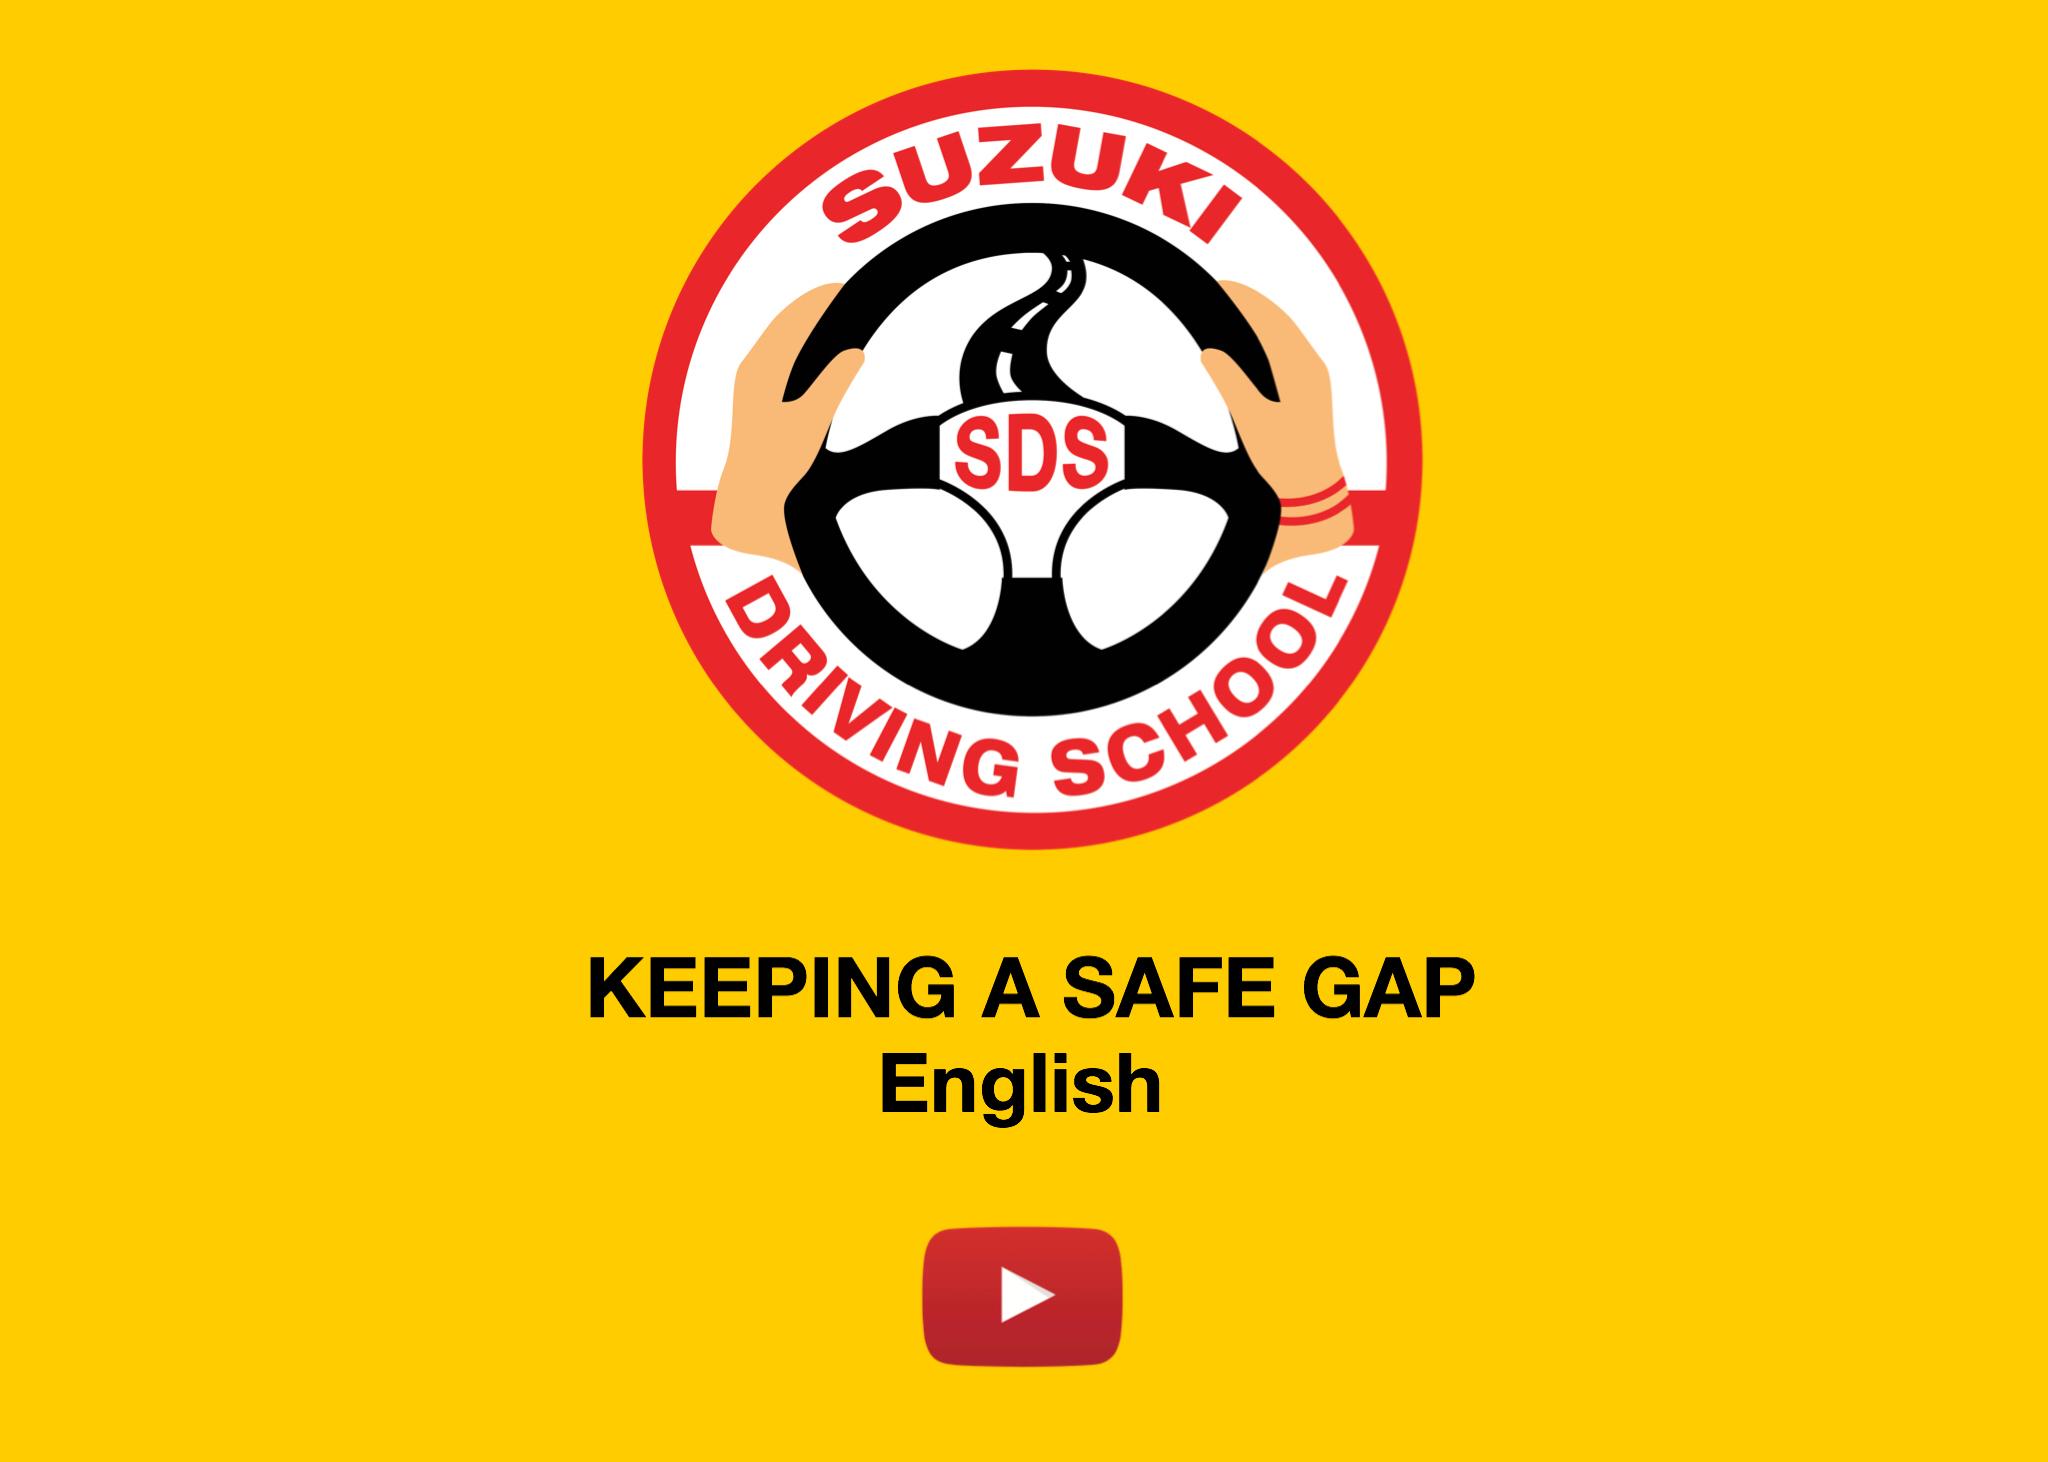 KEEPING A SAFE GAP